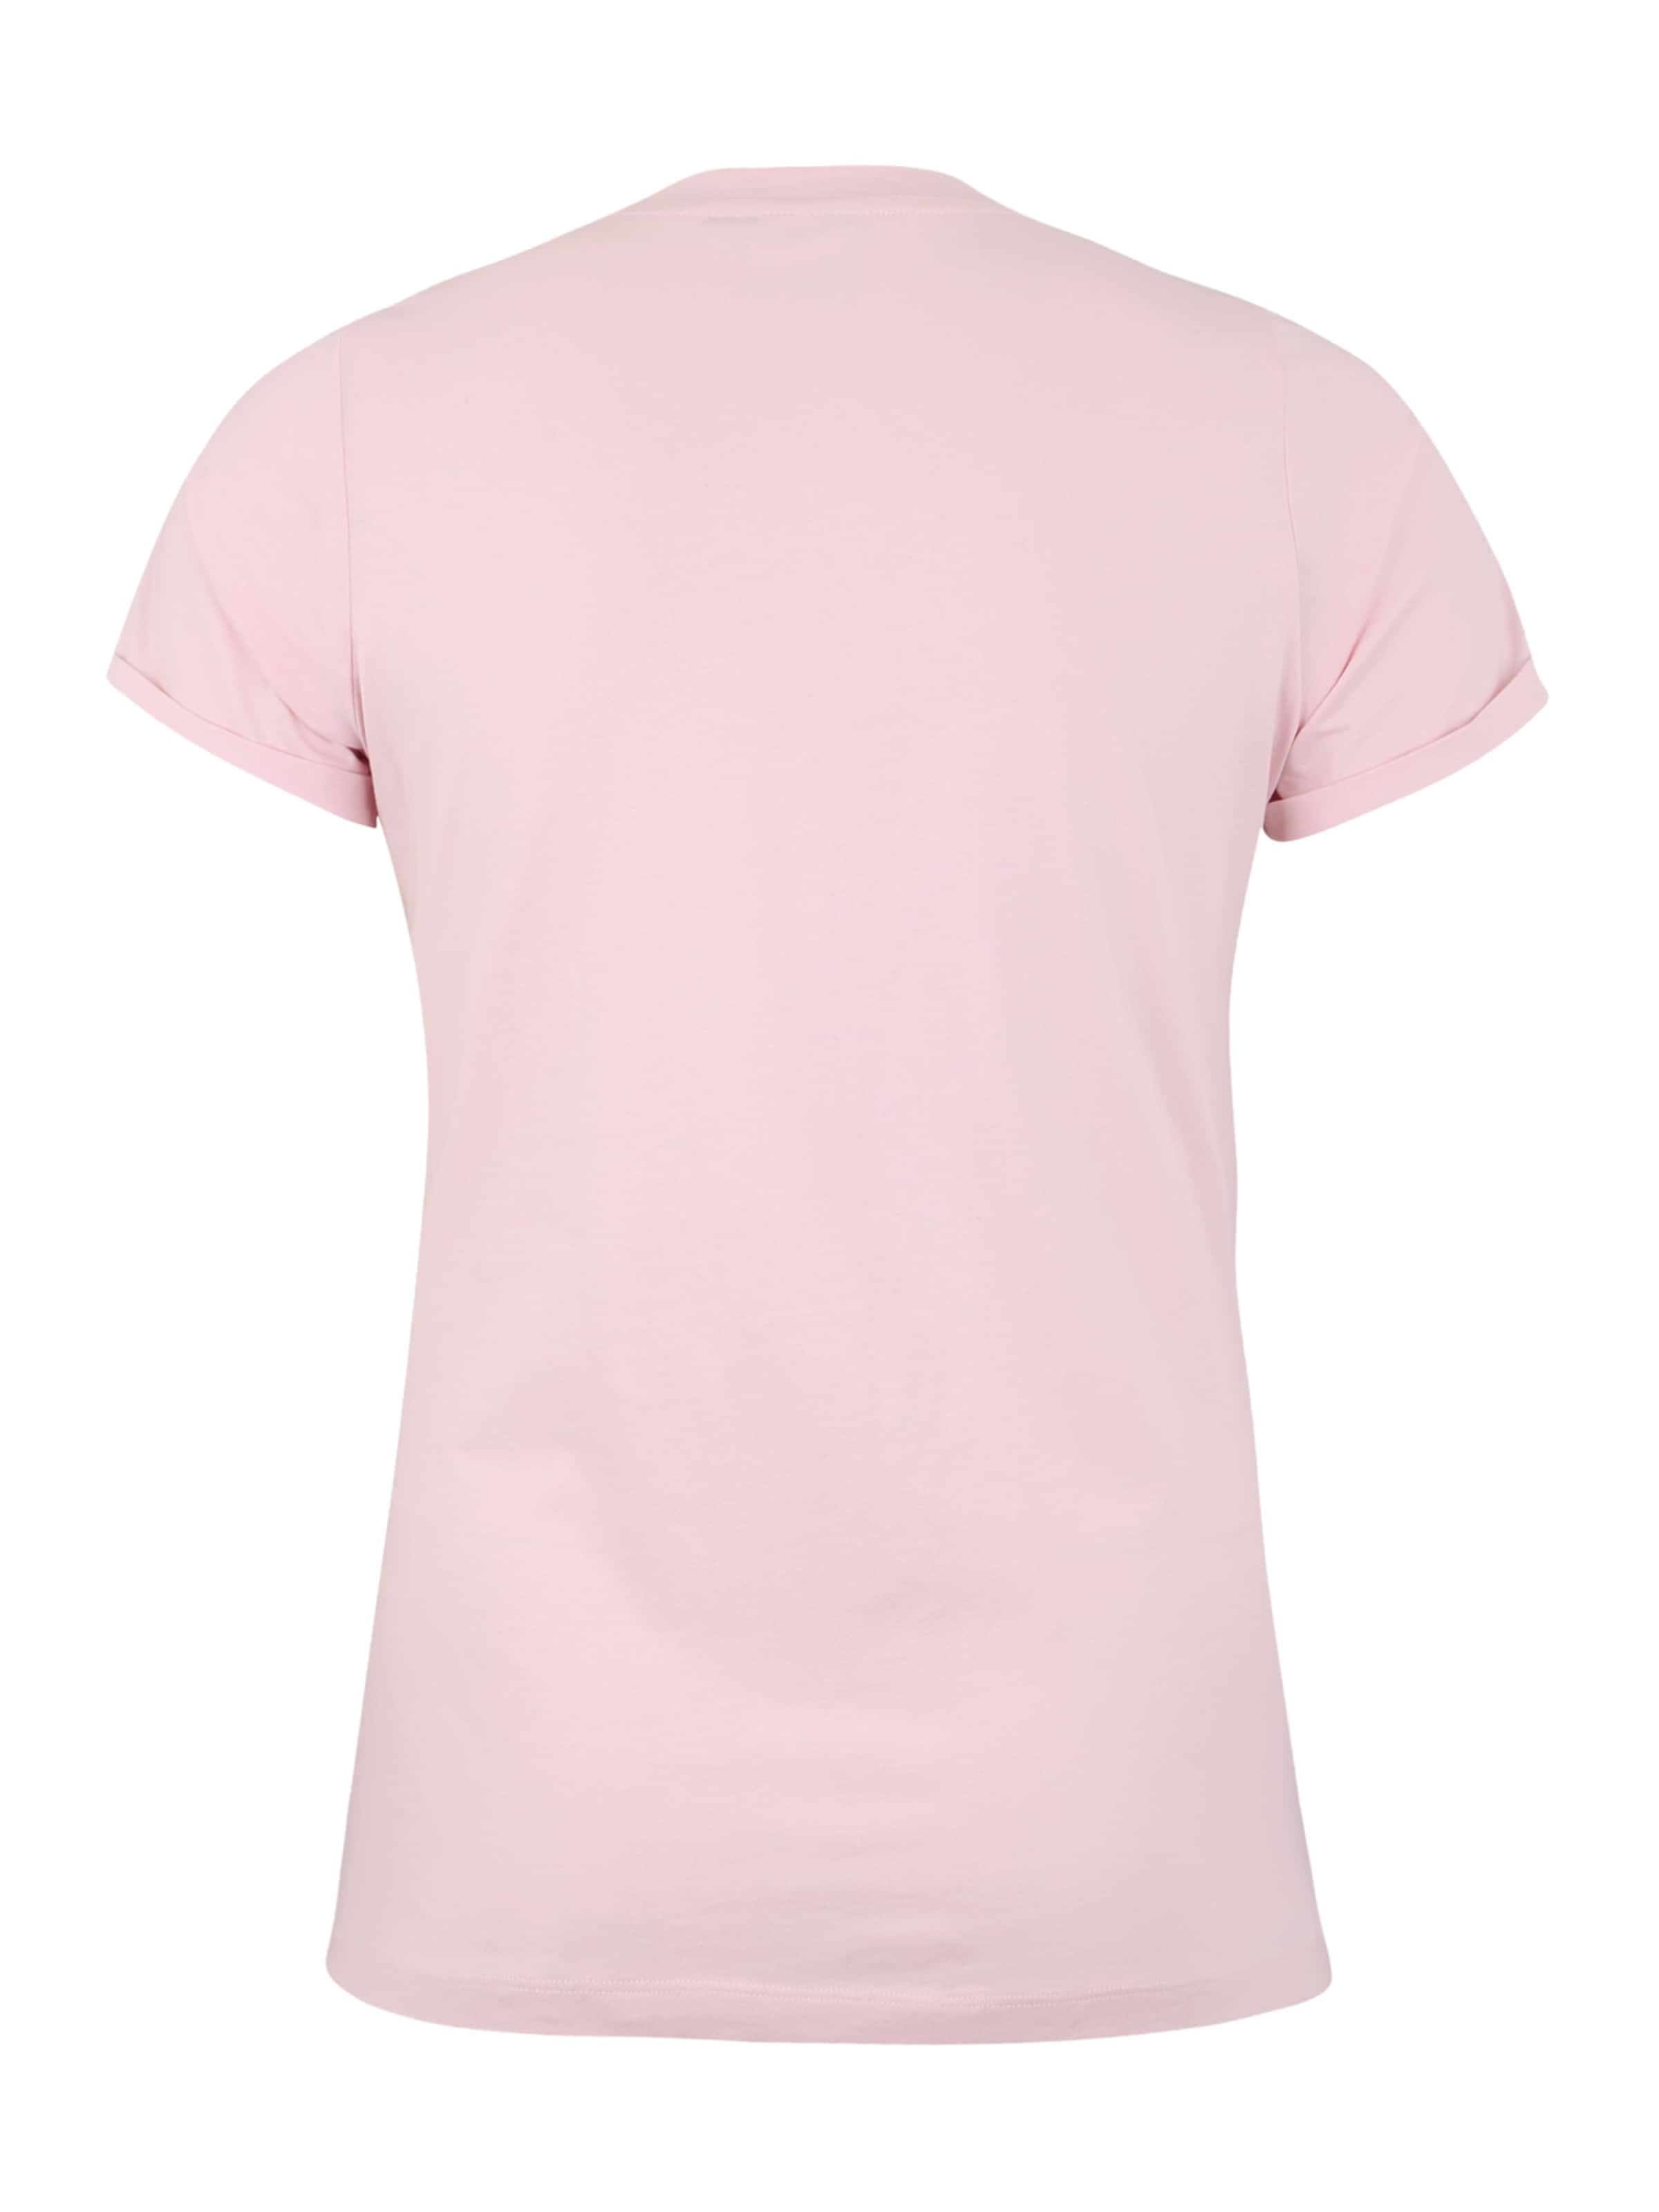 'jrravas En Roxy' Junarose shirt Rose T iTOPlwXZuk